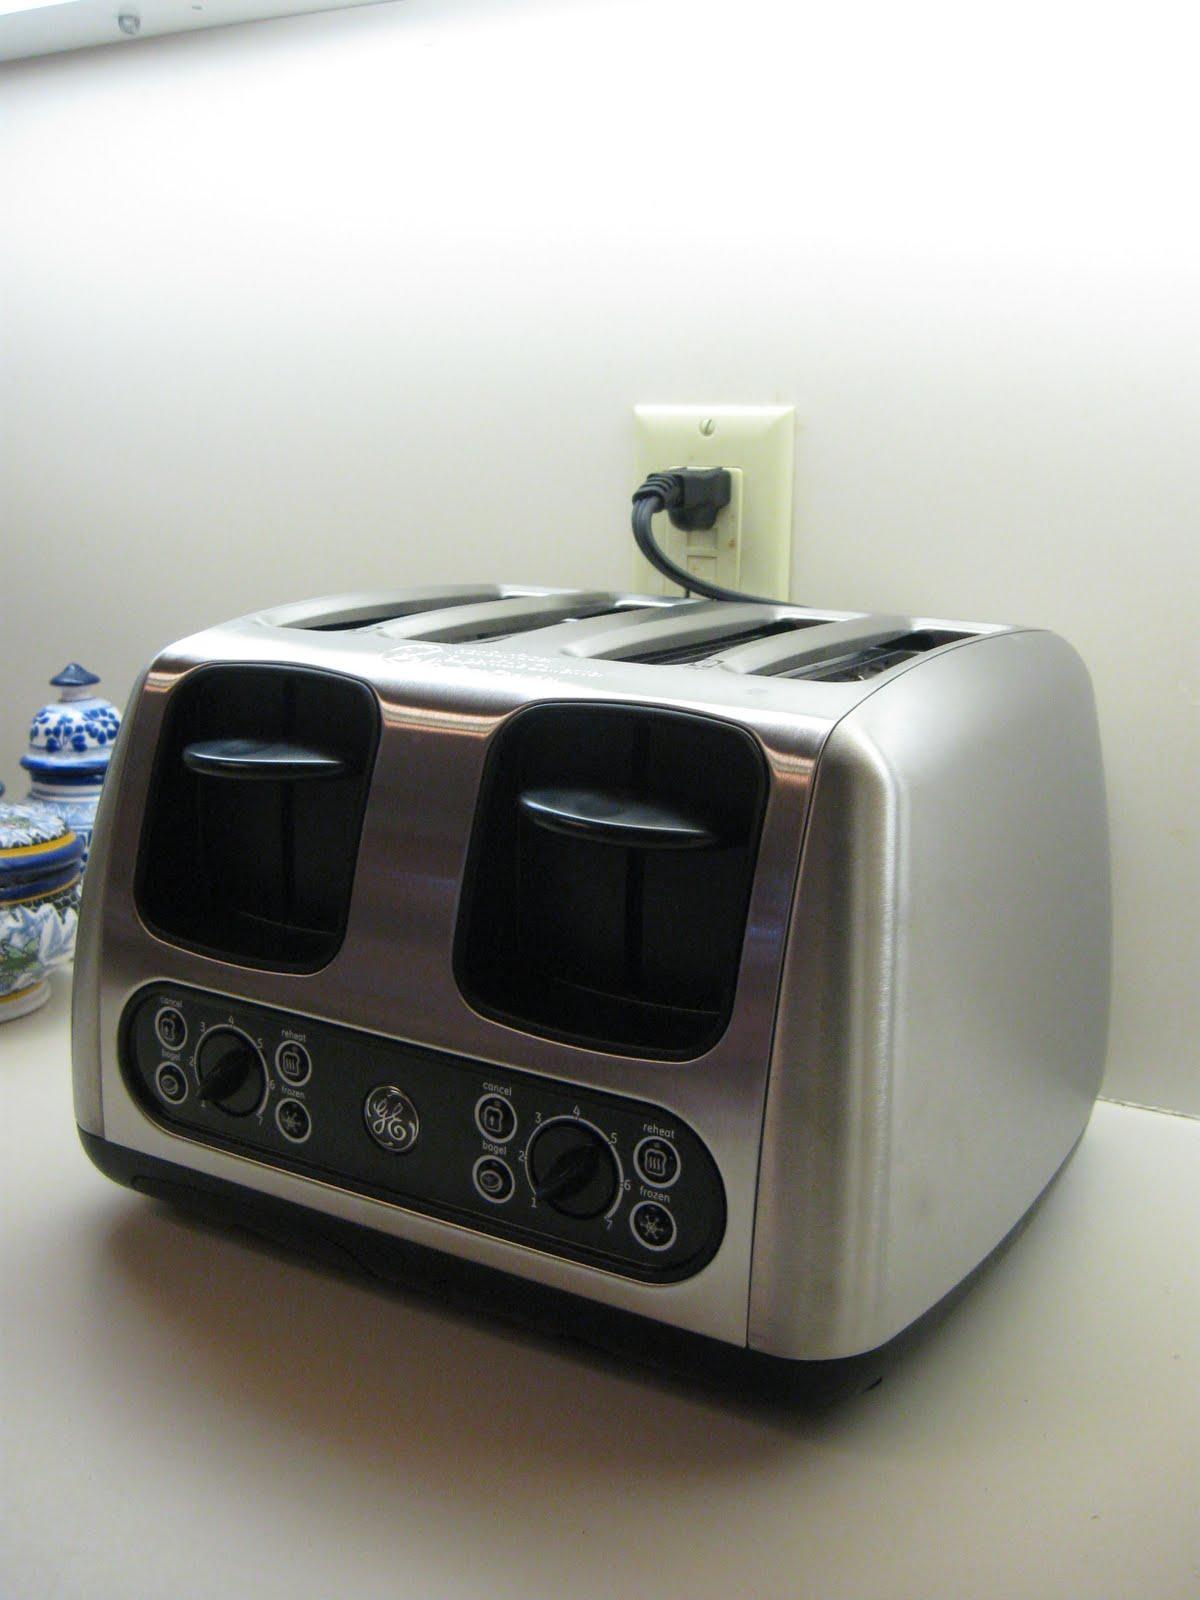 Walmart Ge Toaster Oven ~ The bargain huntress ge toaster